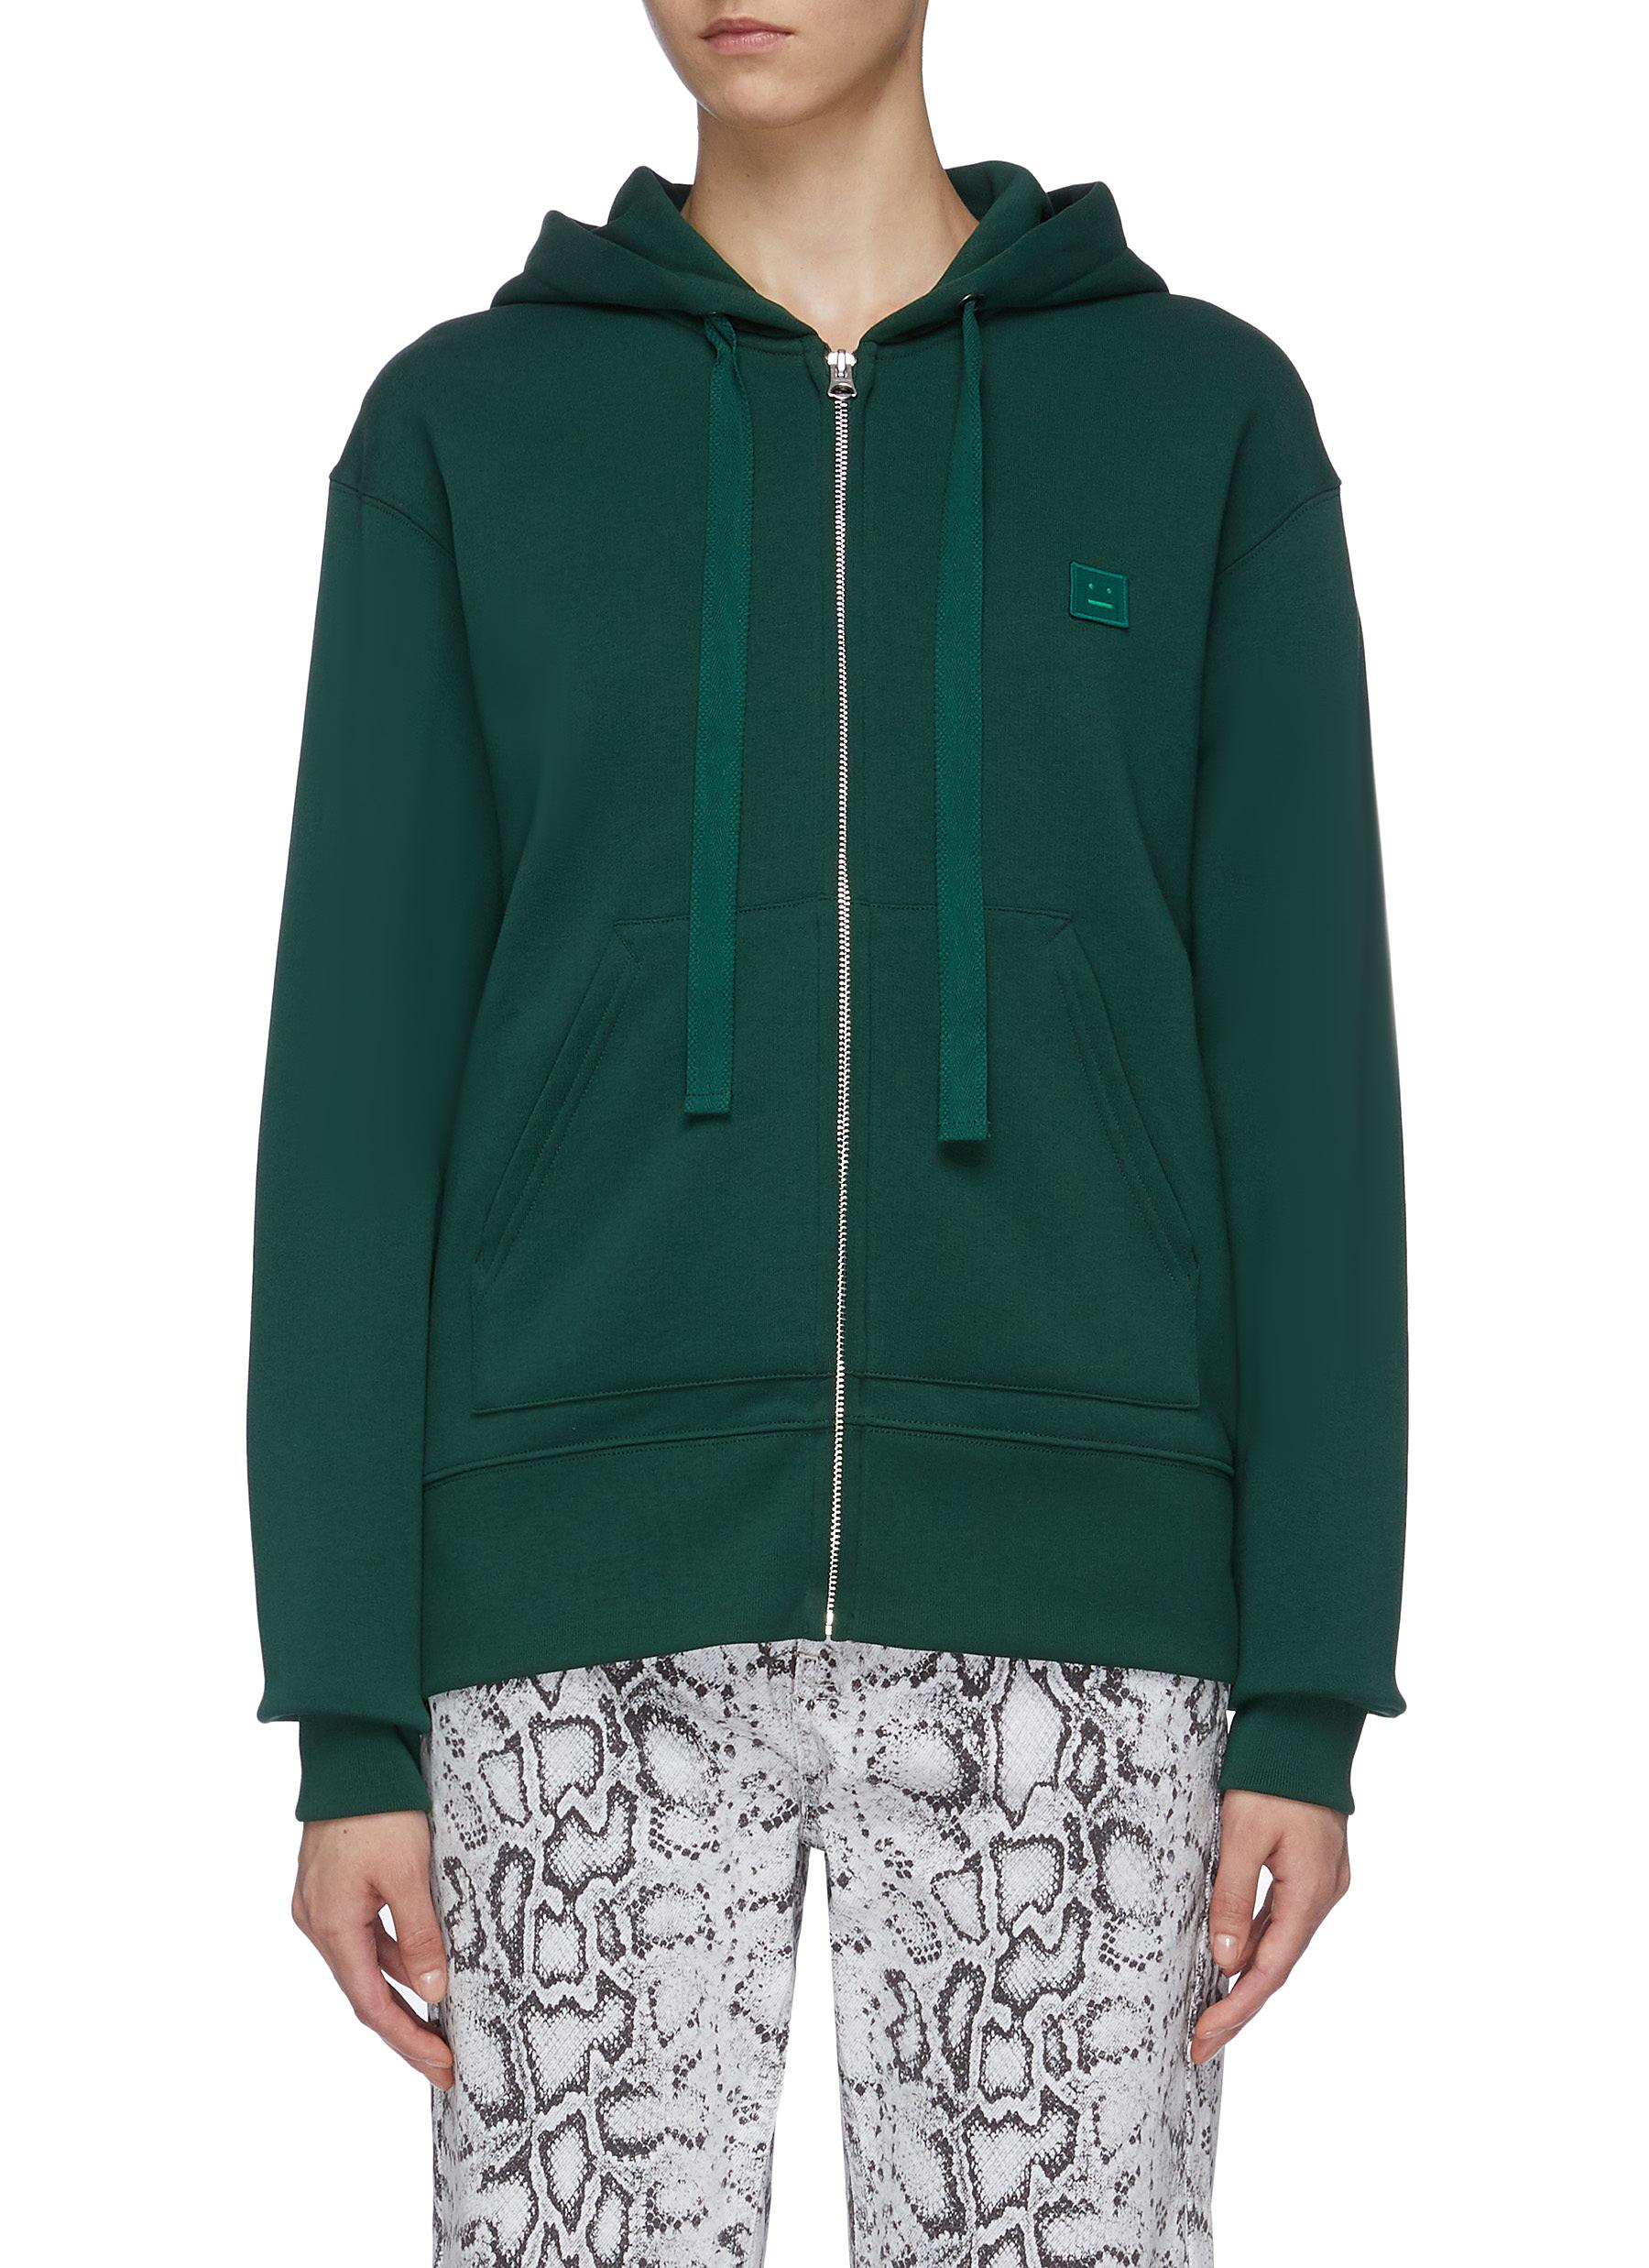 Face patch zip hoodie by Acne Studios